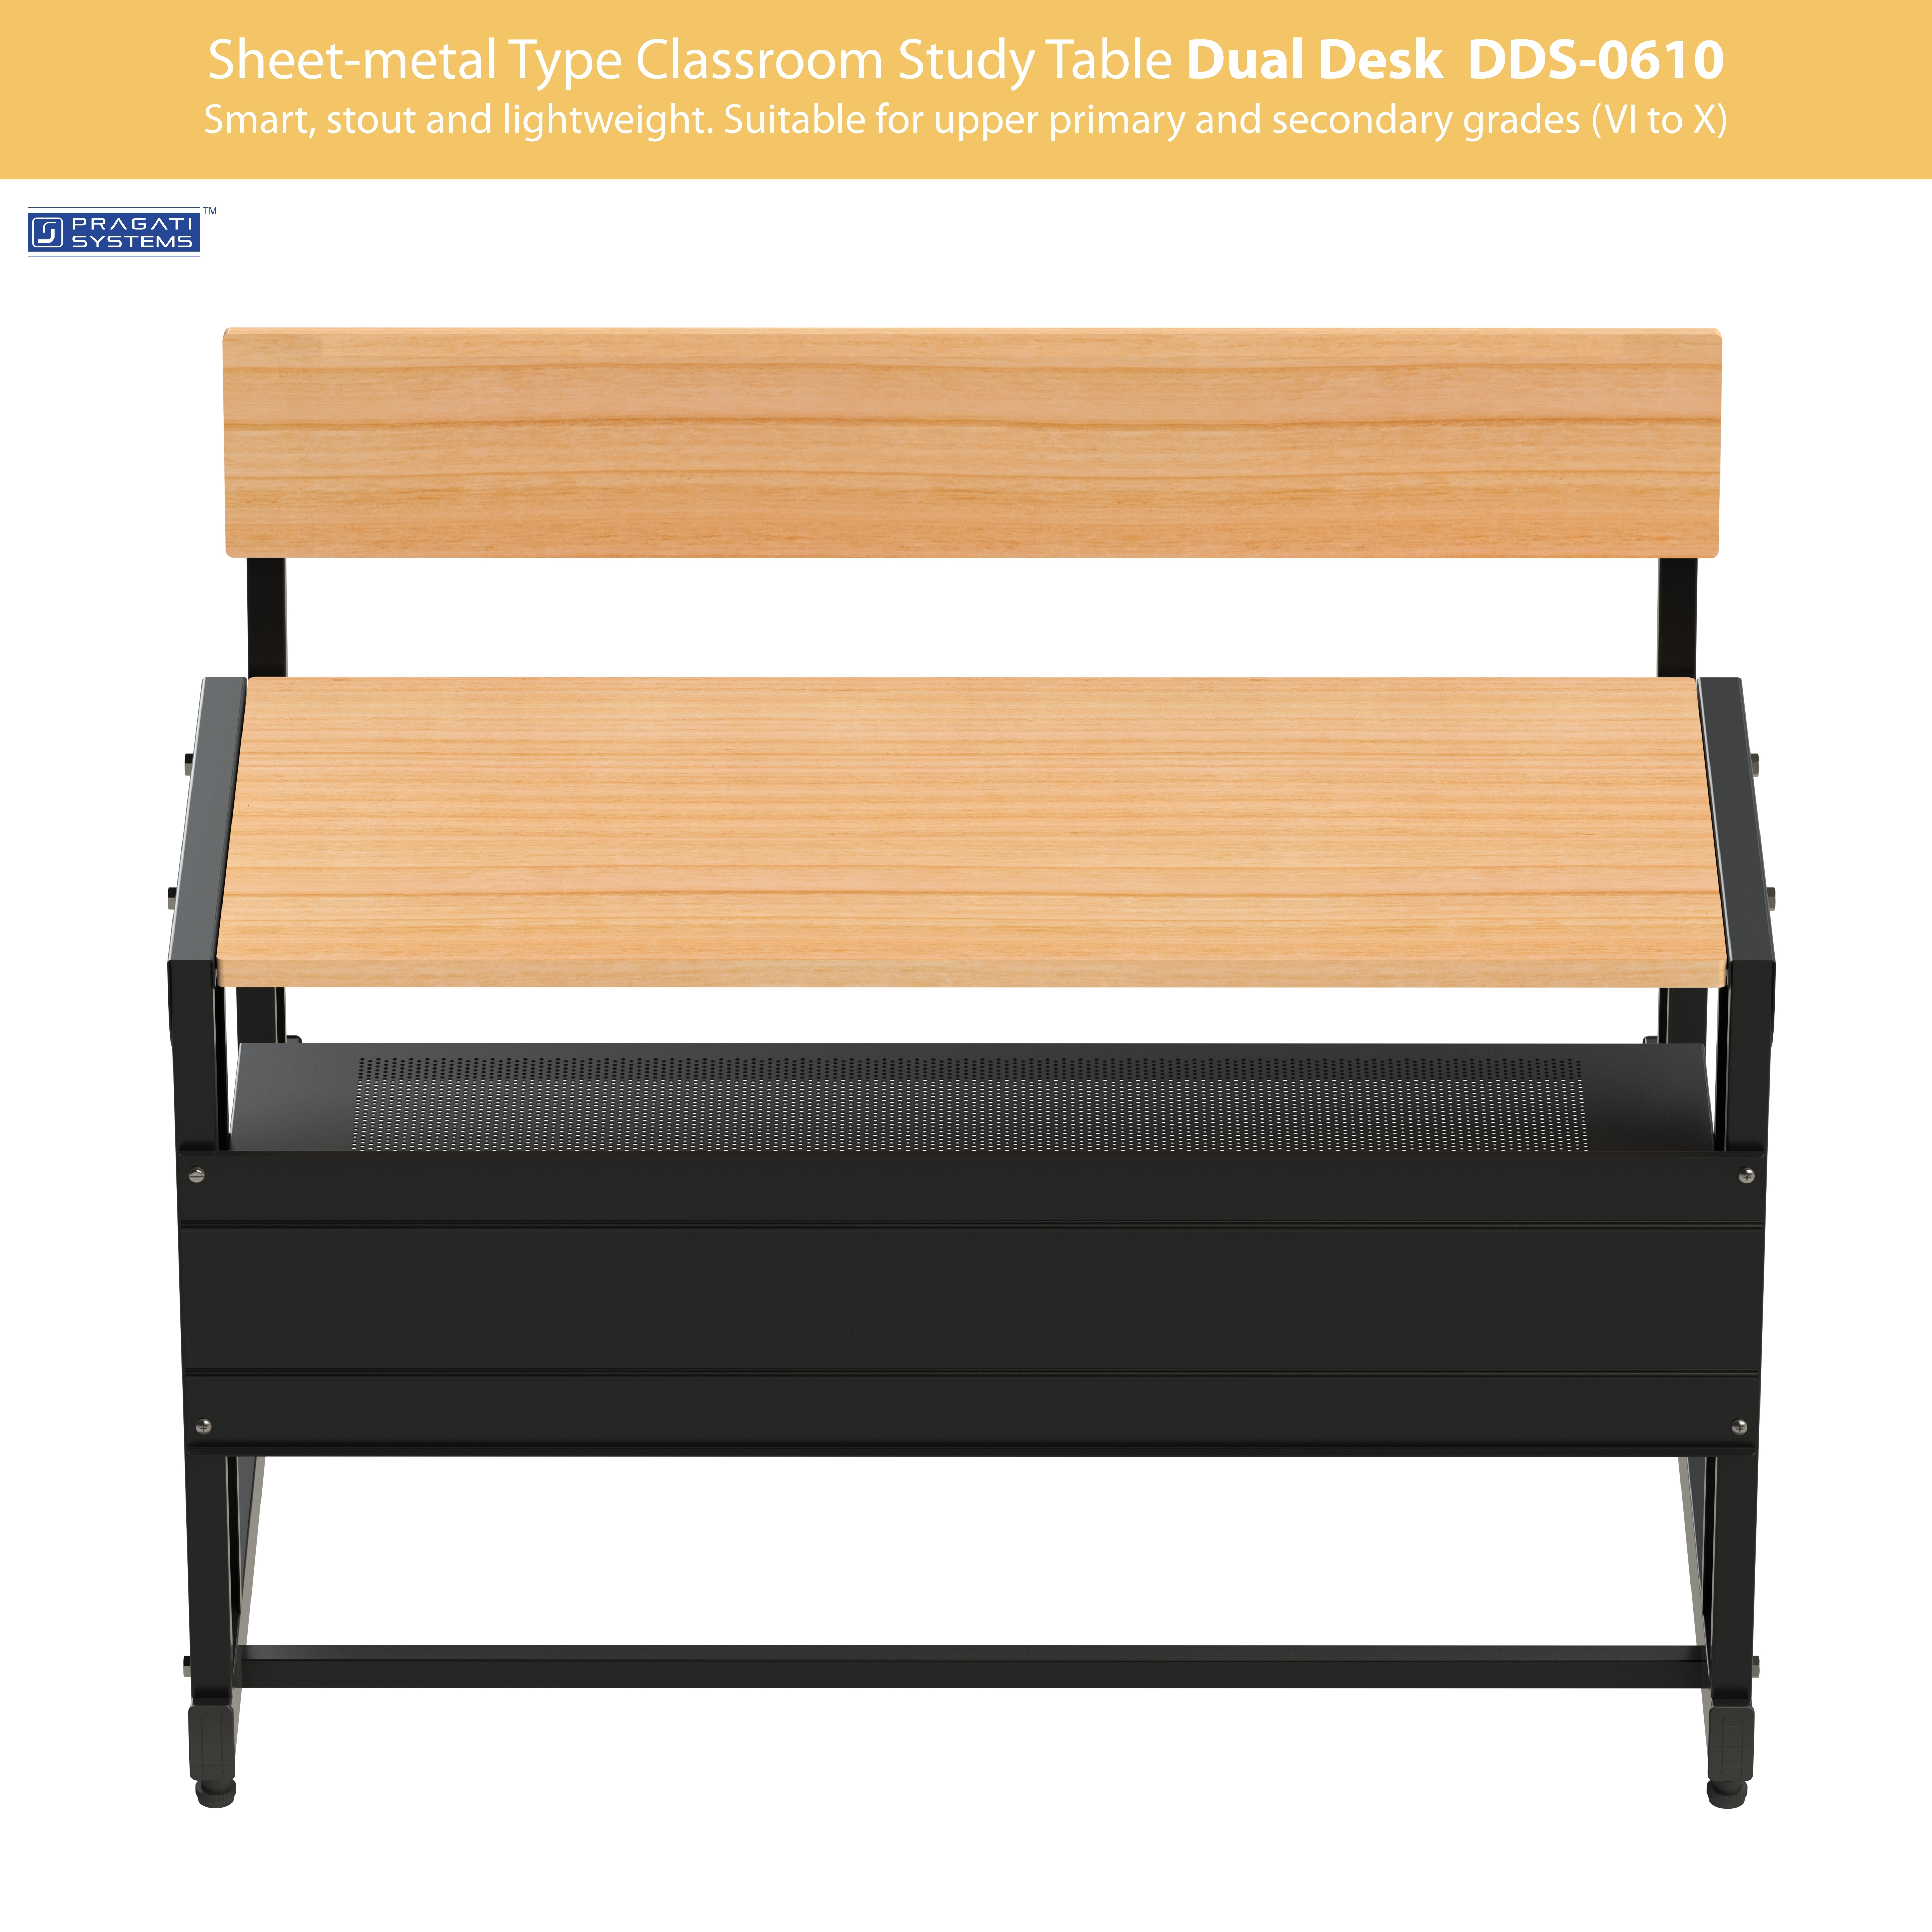 Sheet-metal Classroom Study Dual Desk DDS-0610